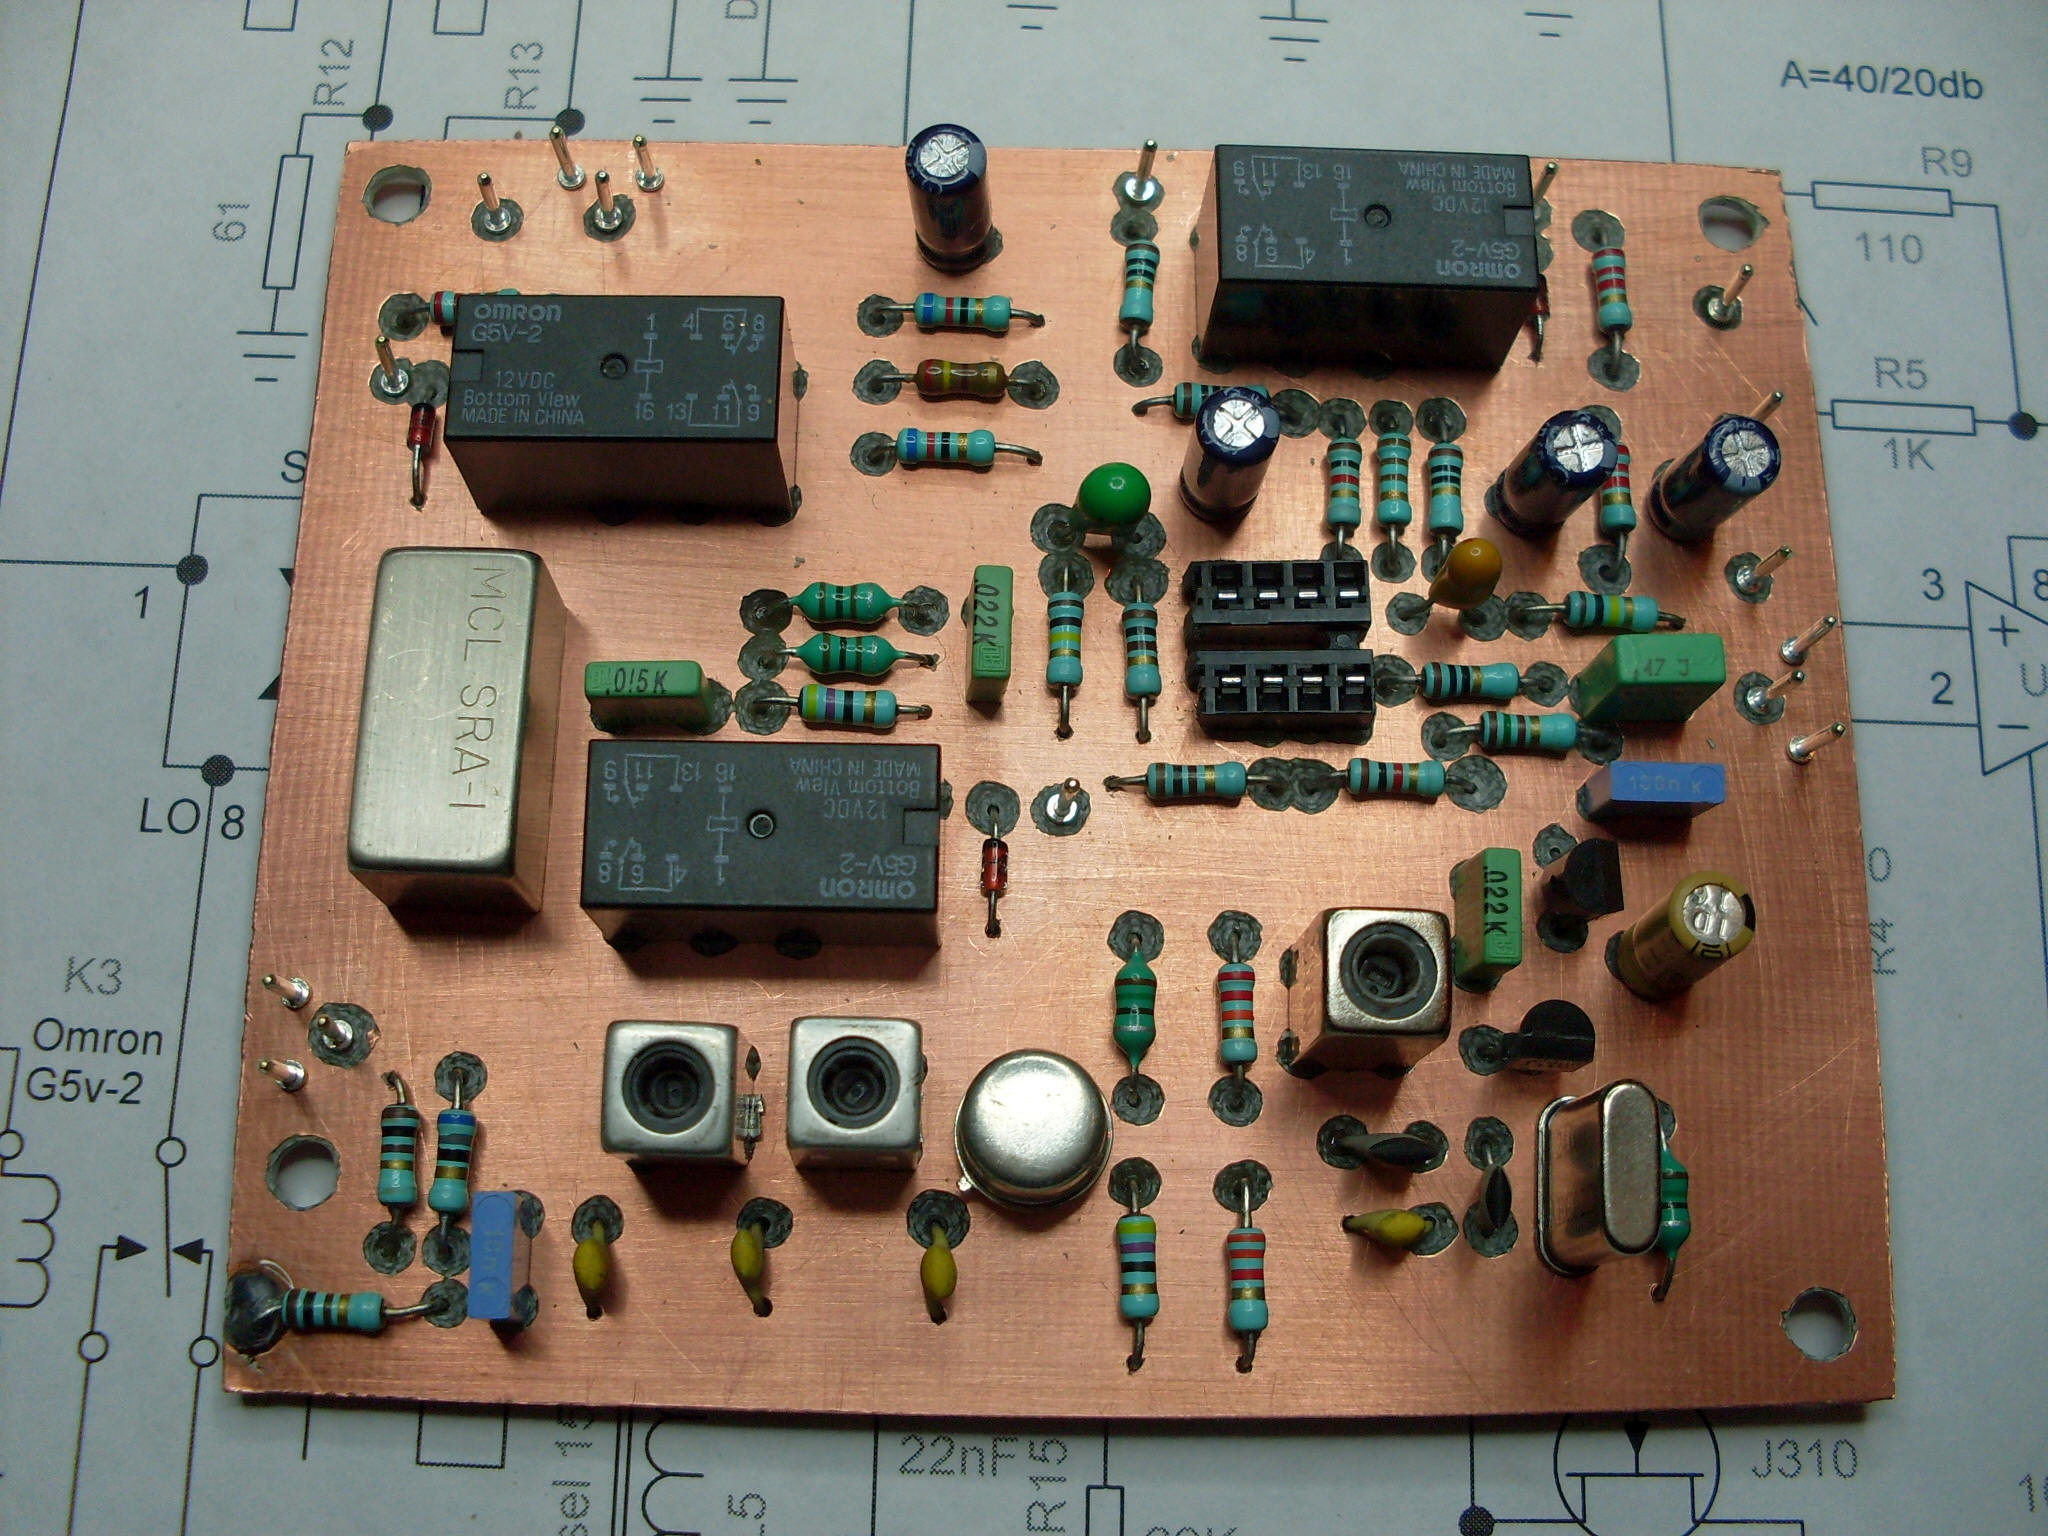 diy rf spectrum analyzer - DIY Unixcode